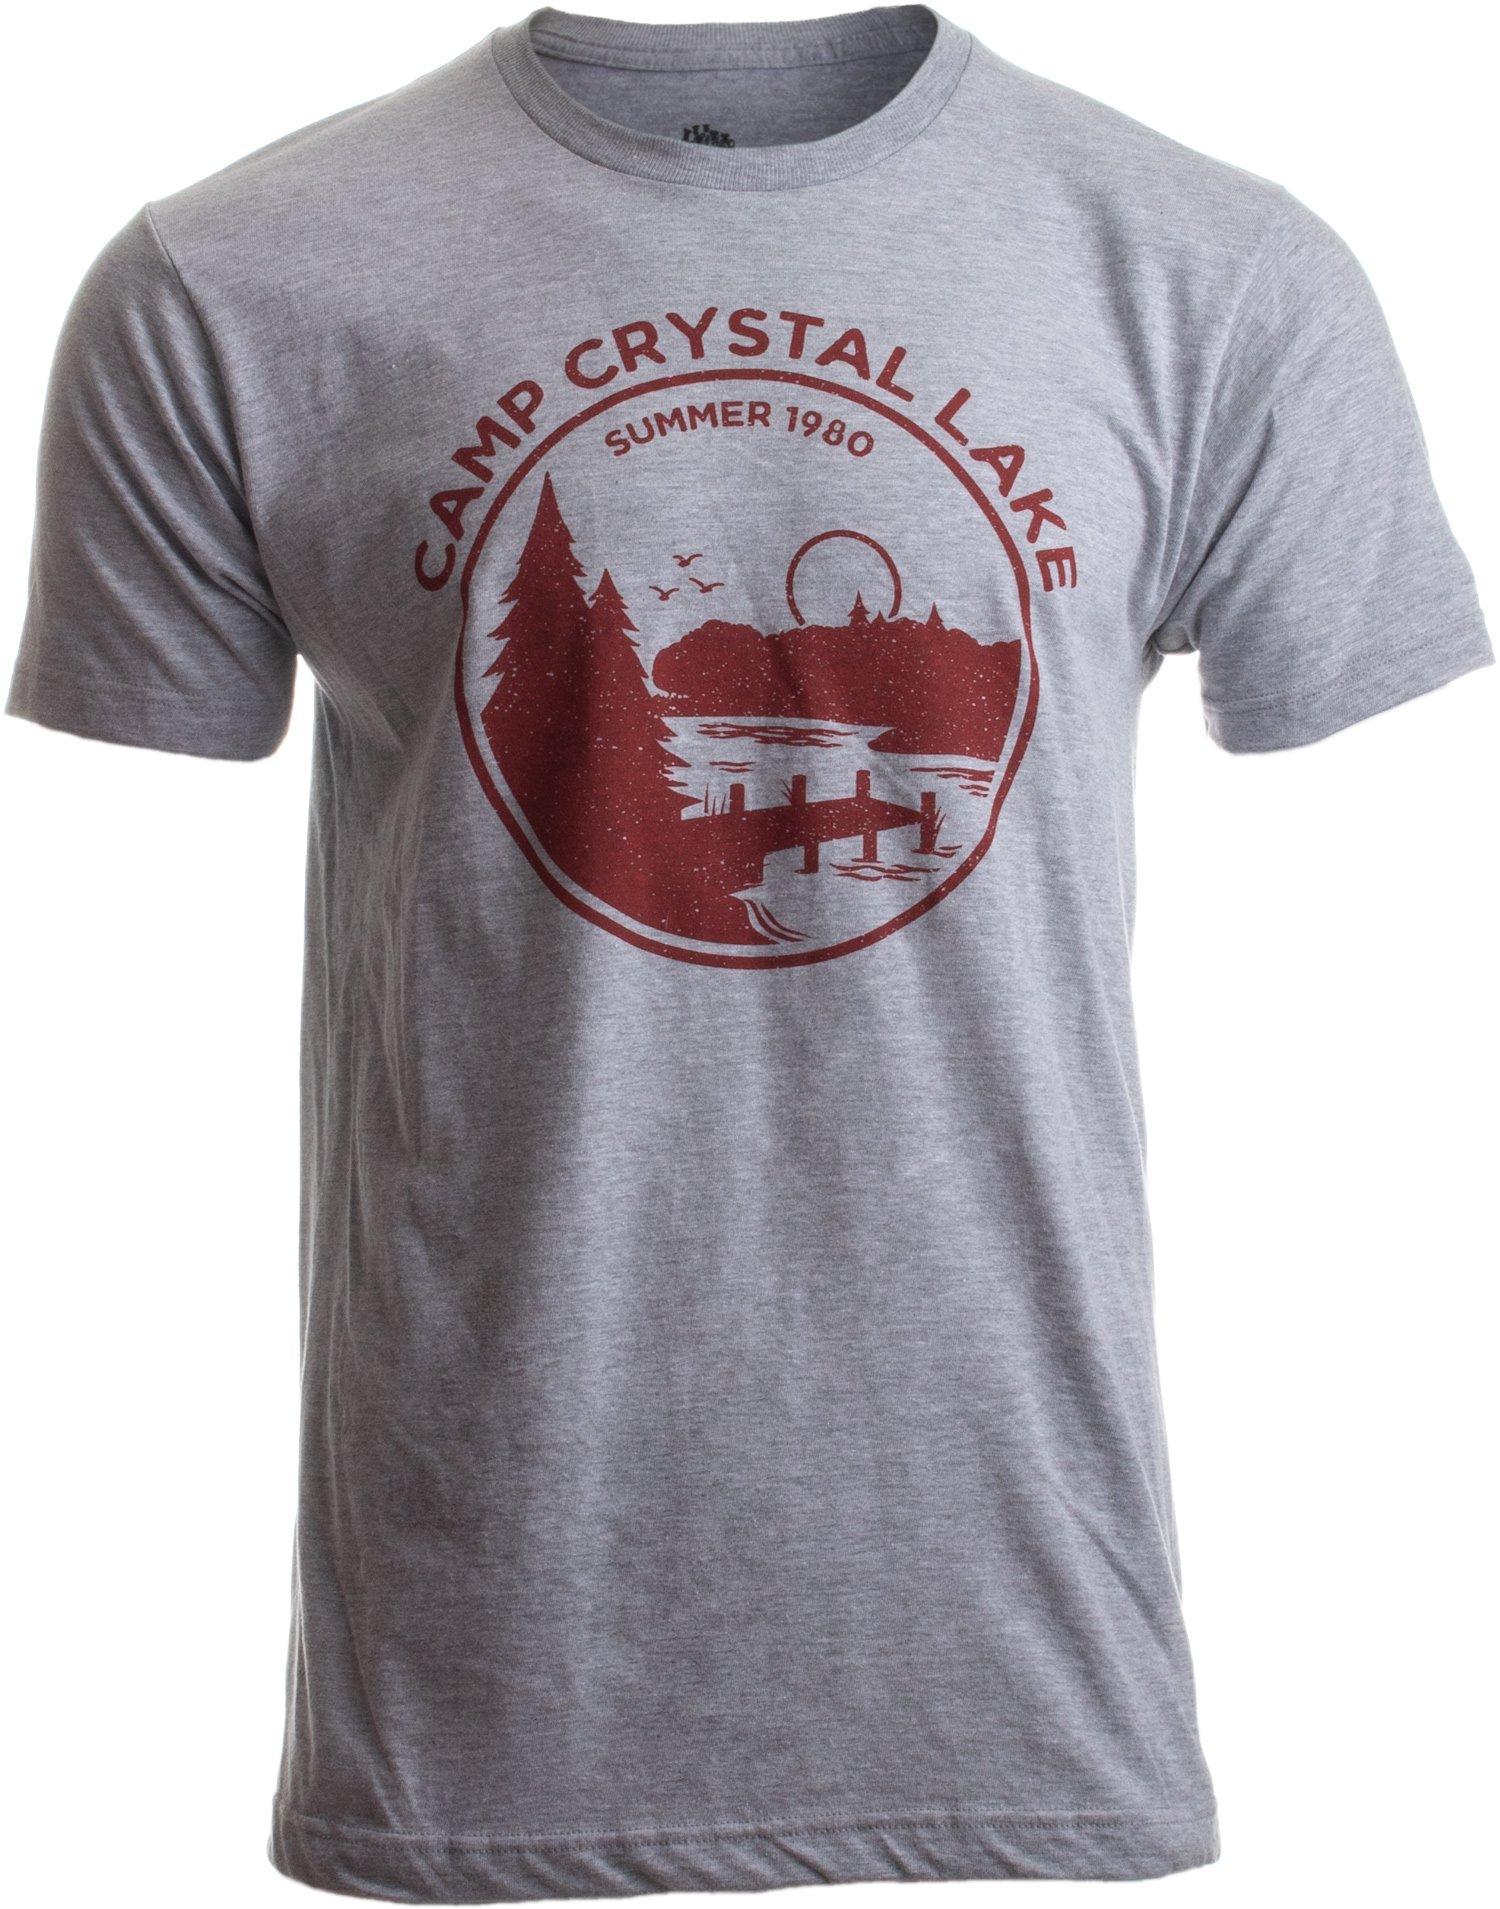 1980 Camp Crystal Lake Counselor | Funny 80s Horror Movie Fan Jason Joke T-Shirt-(Adult,M)